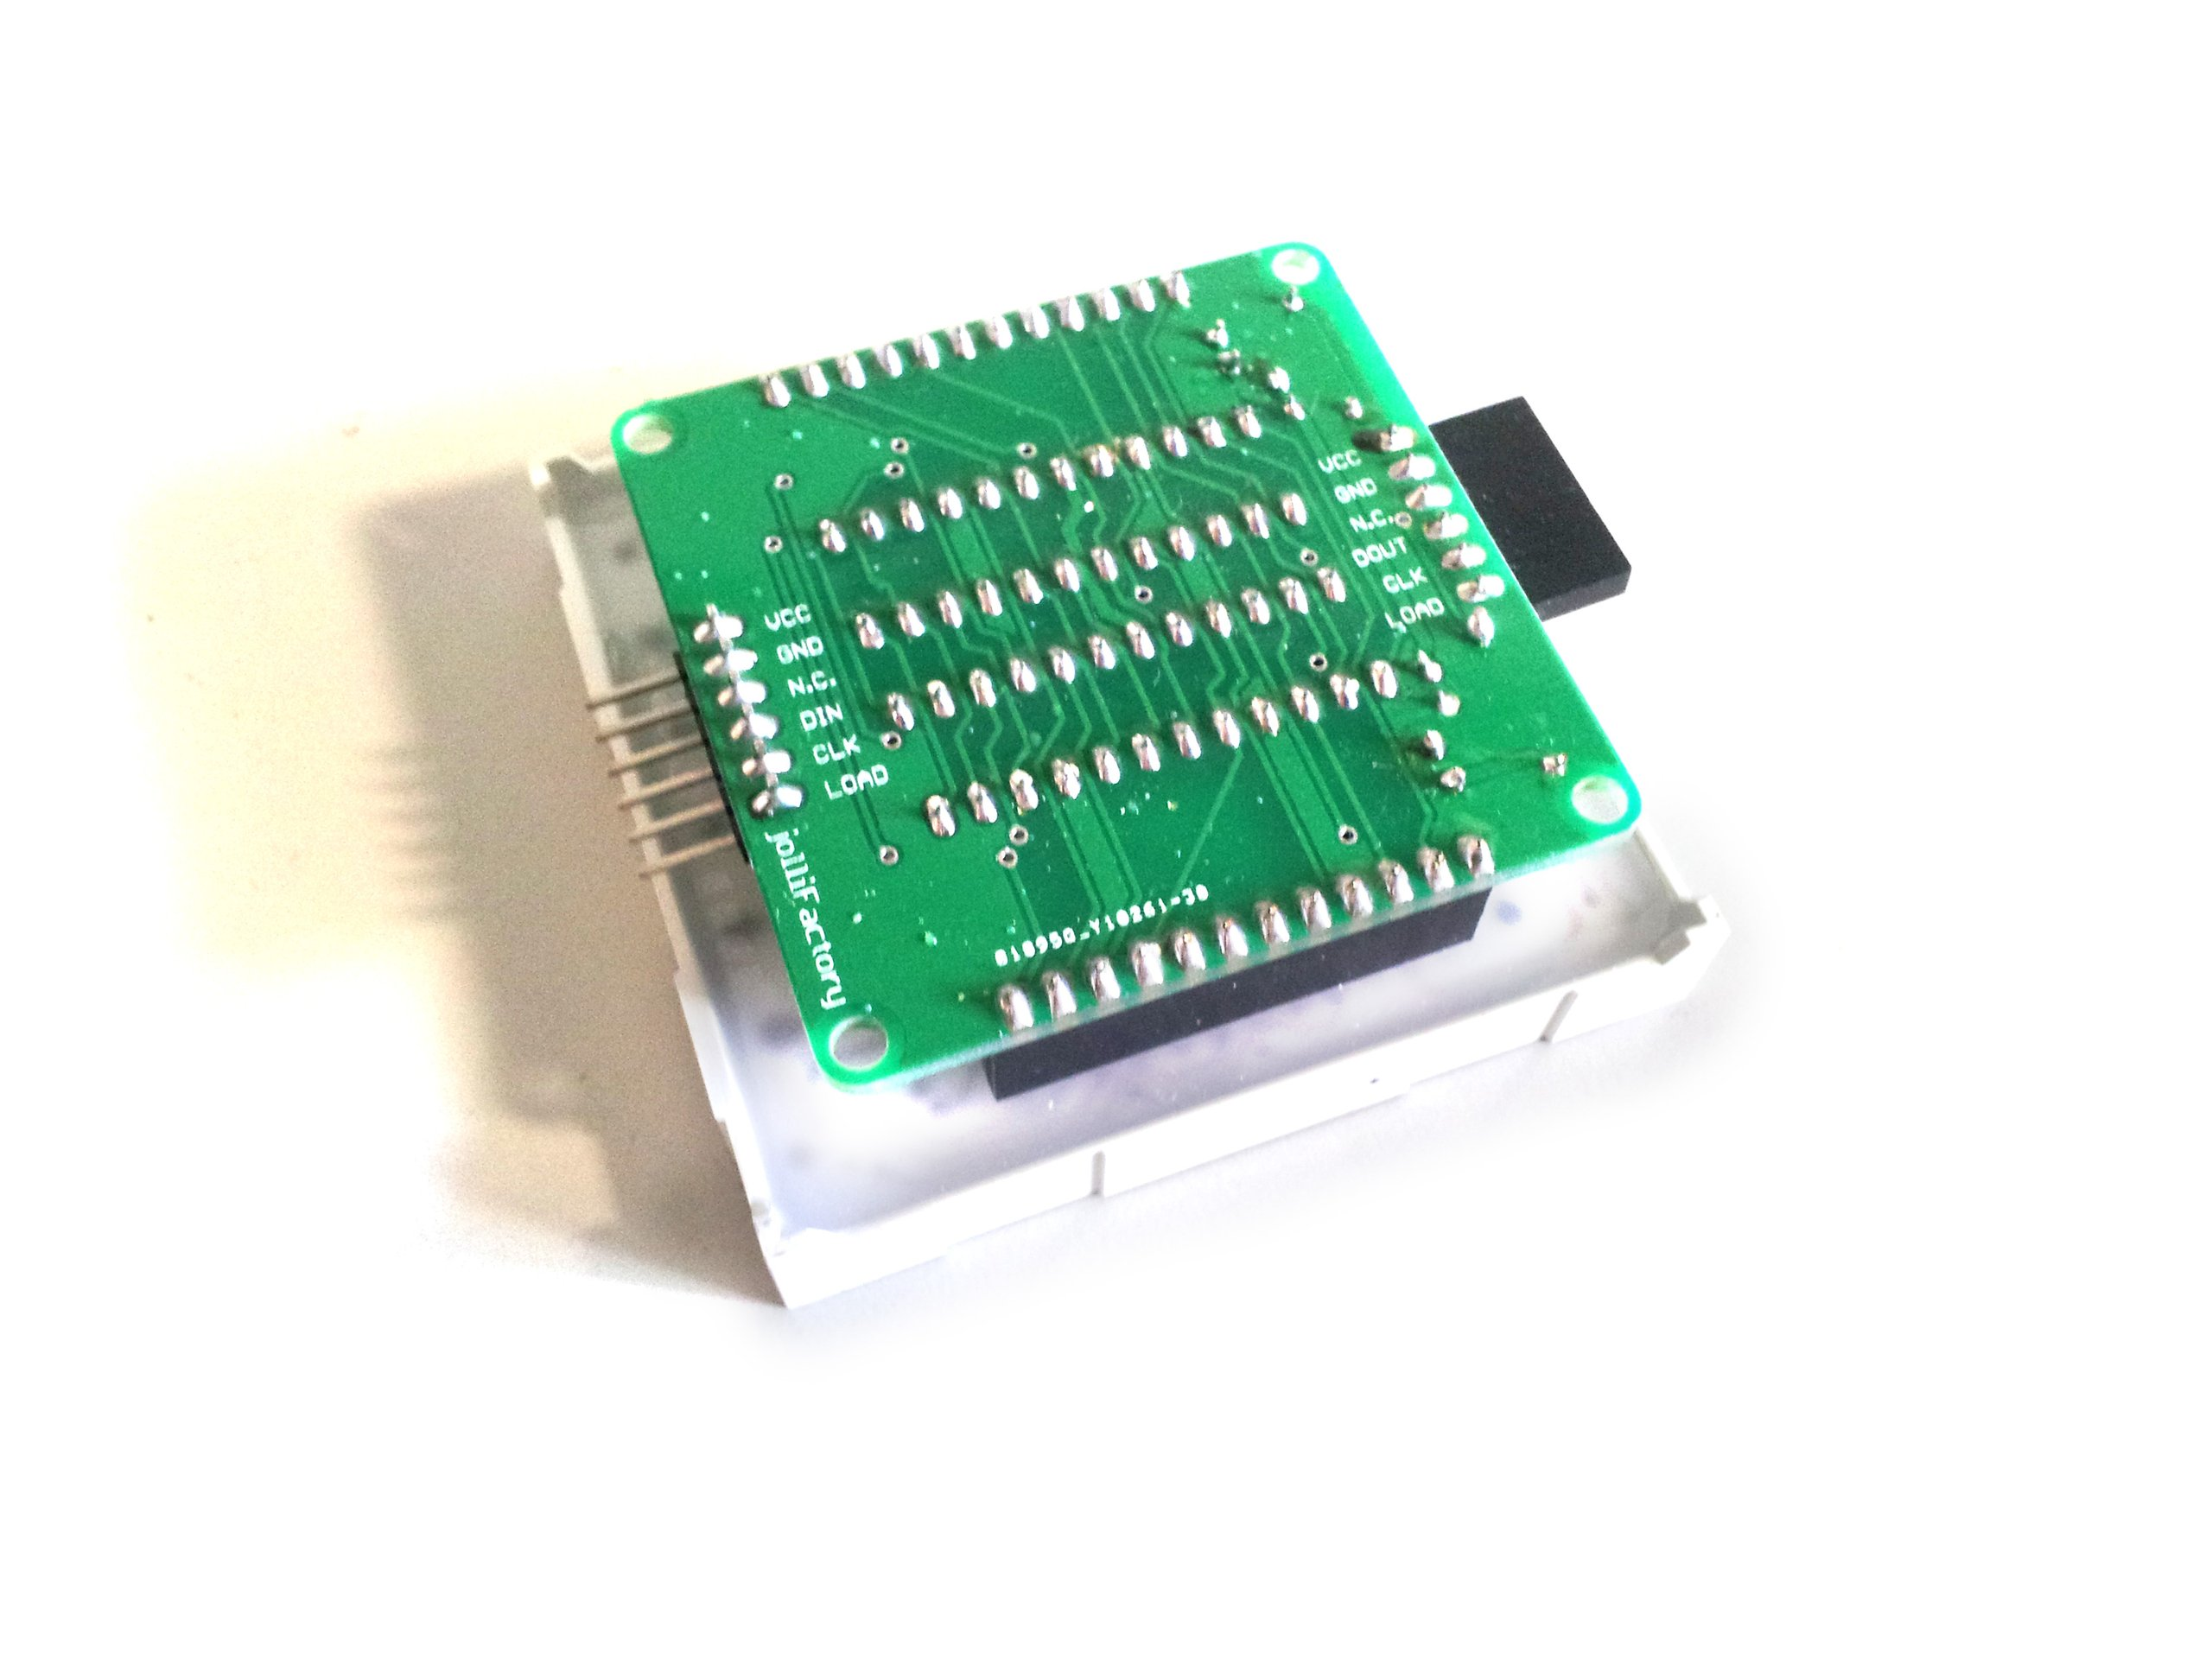 60mmx60mm Bicolor LED Matrix Driver Module DIY Kit from Nick64 on Tindie